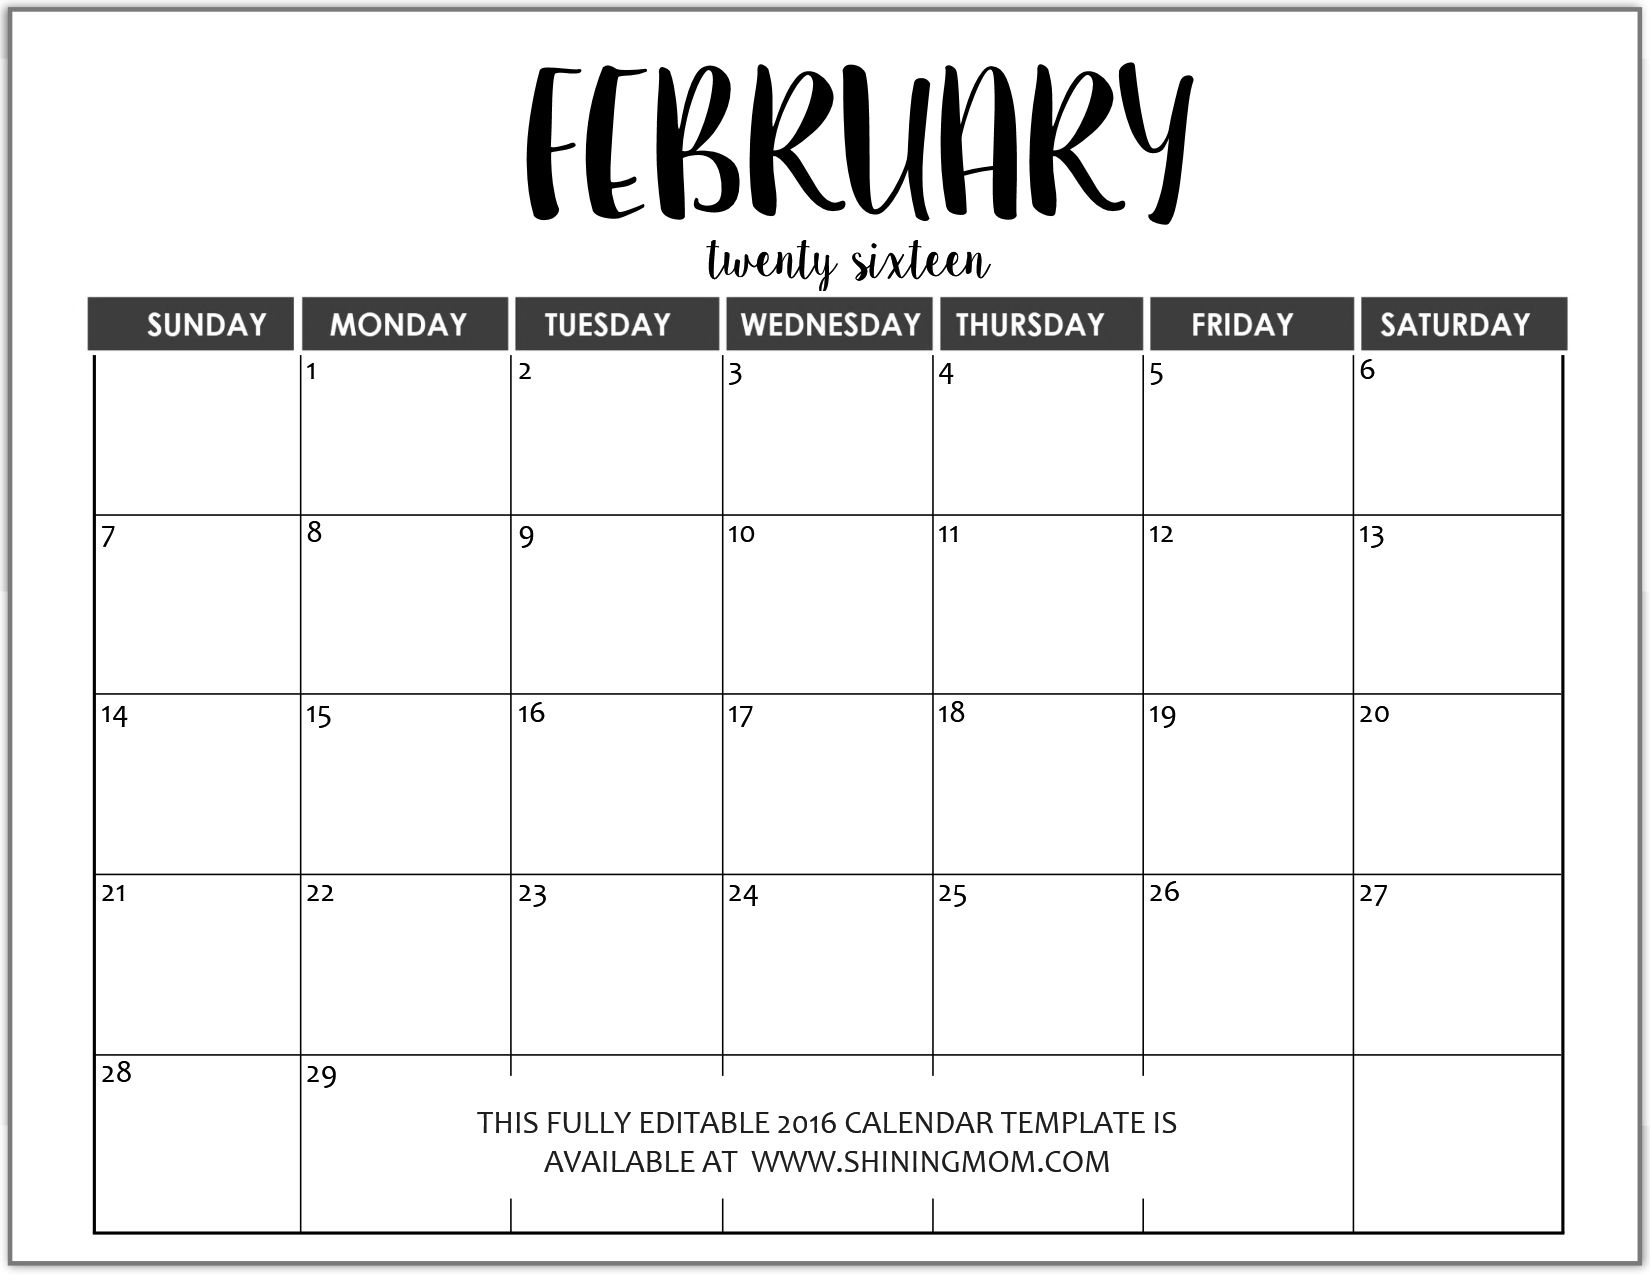 Just In: Fully Editable 2016 Calendar Templates In Ms Word Format regarding Microsoft November Calendar Templates